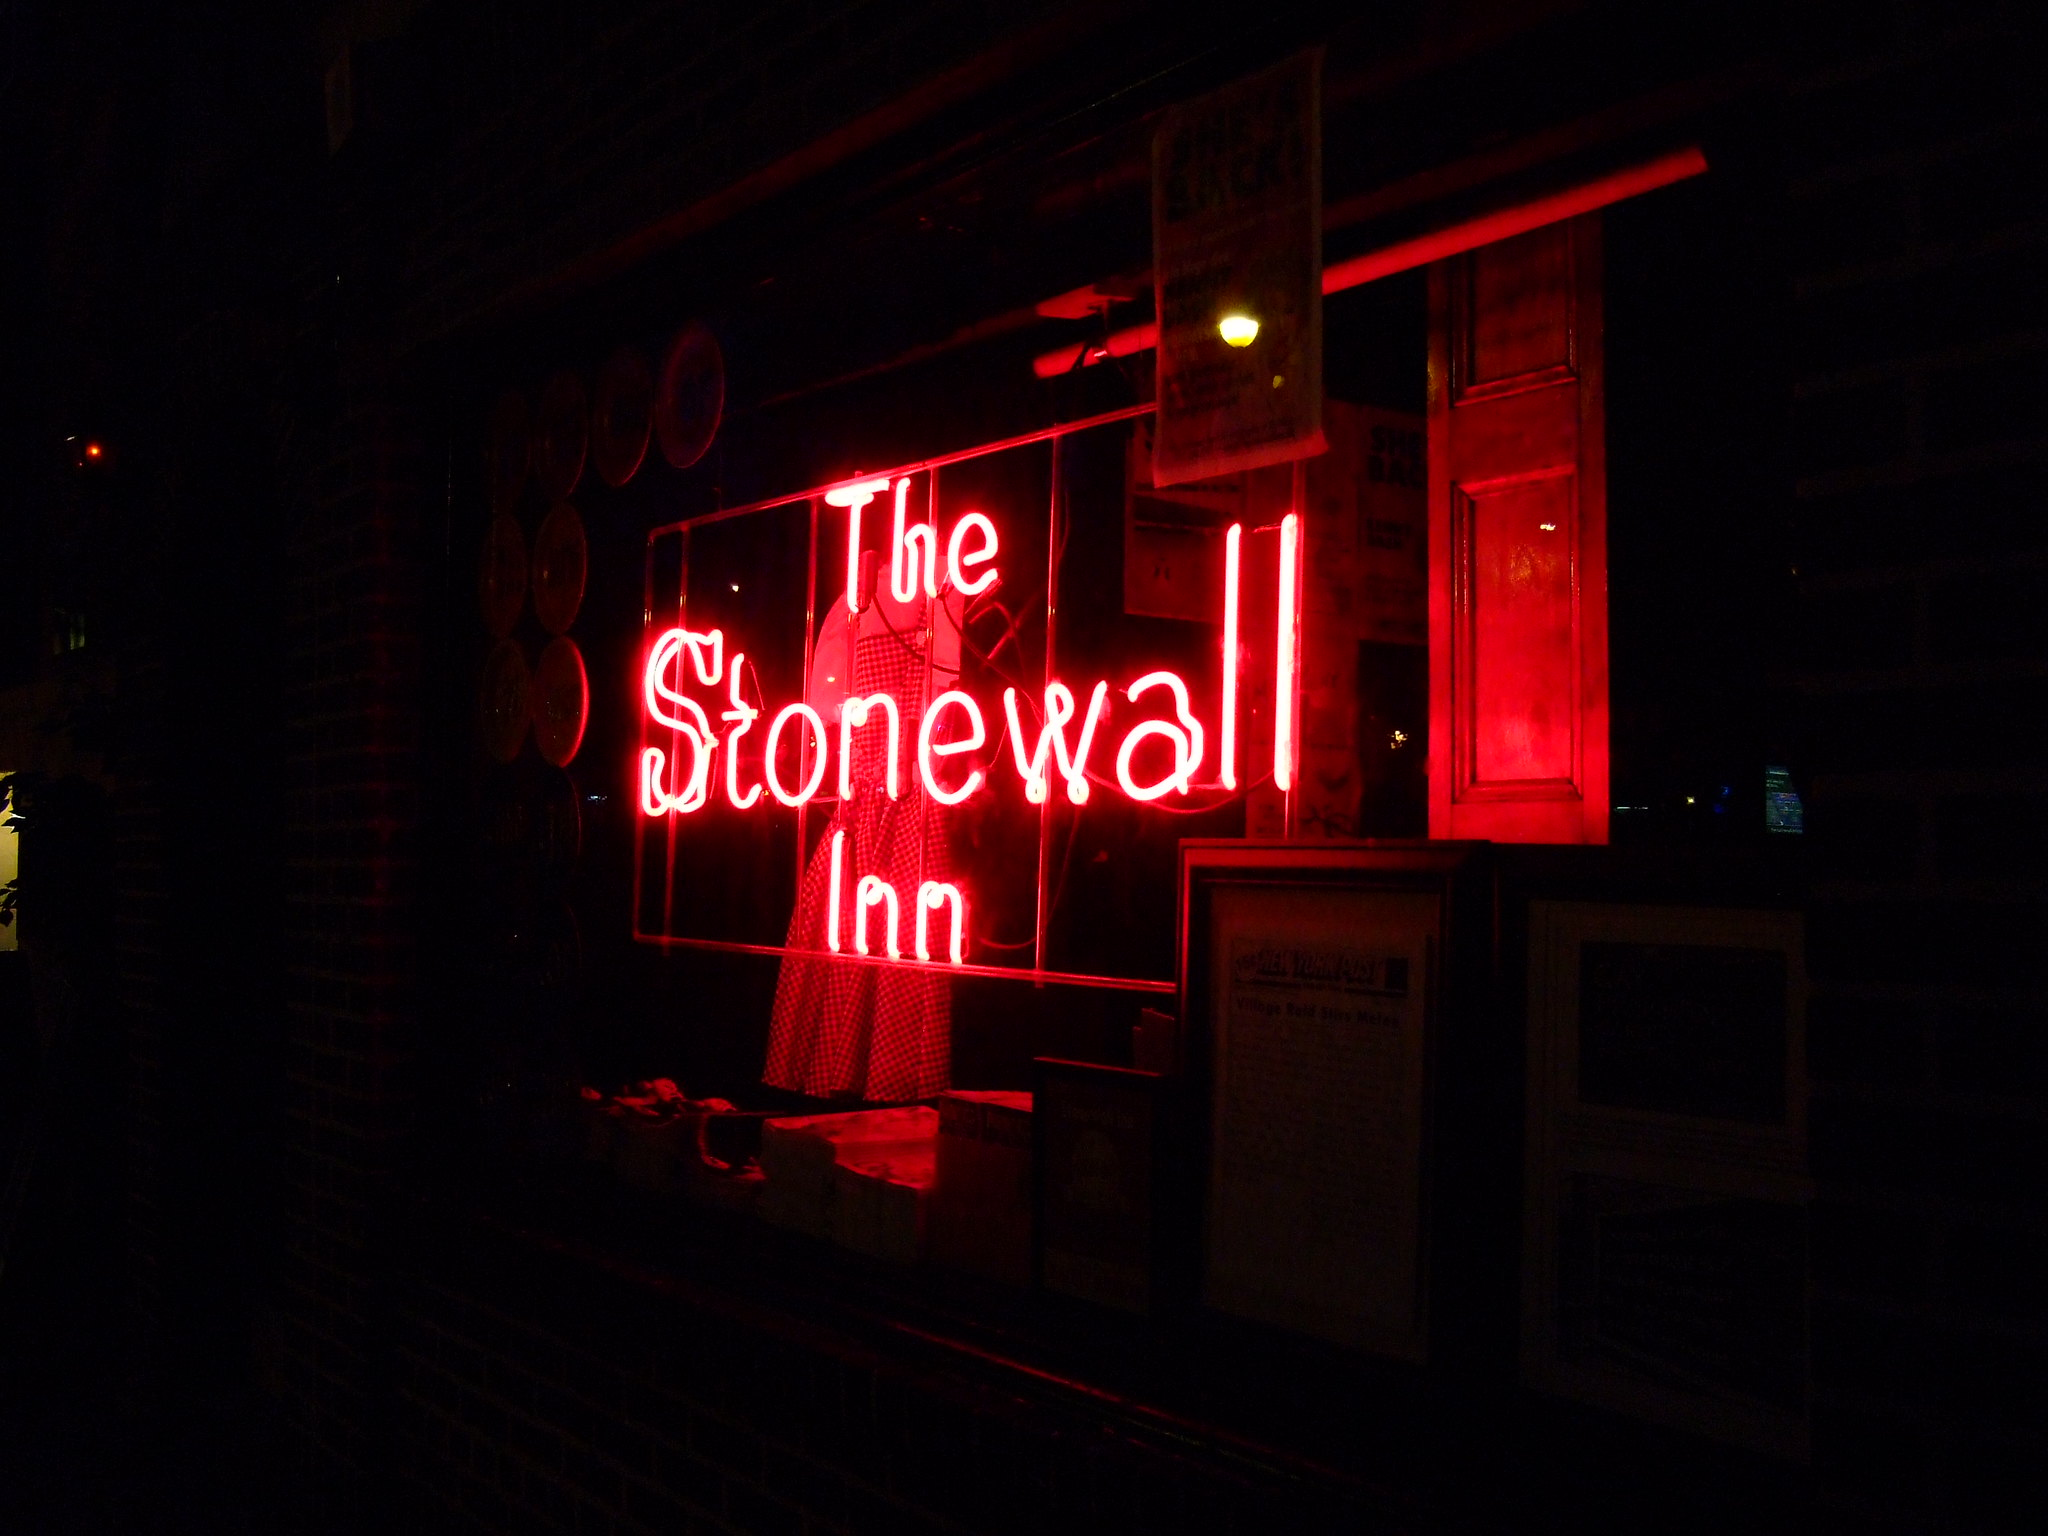 The Stonewall Inn neon sign